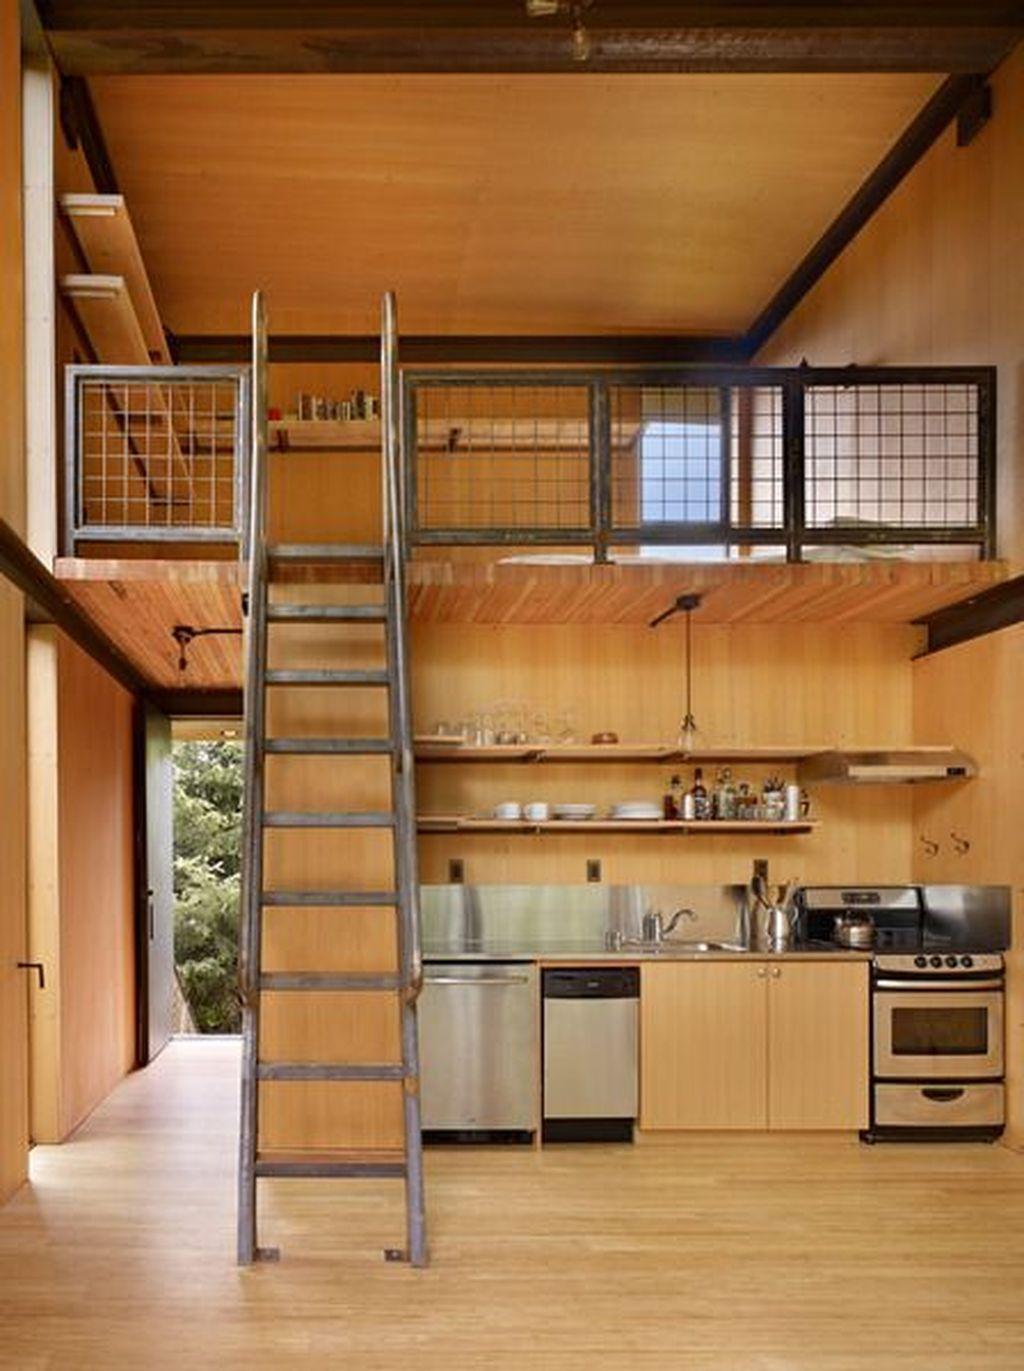 20+ Awesome Tiny House Design Ideas